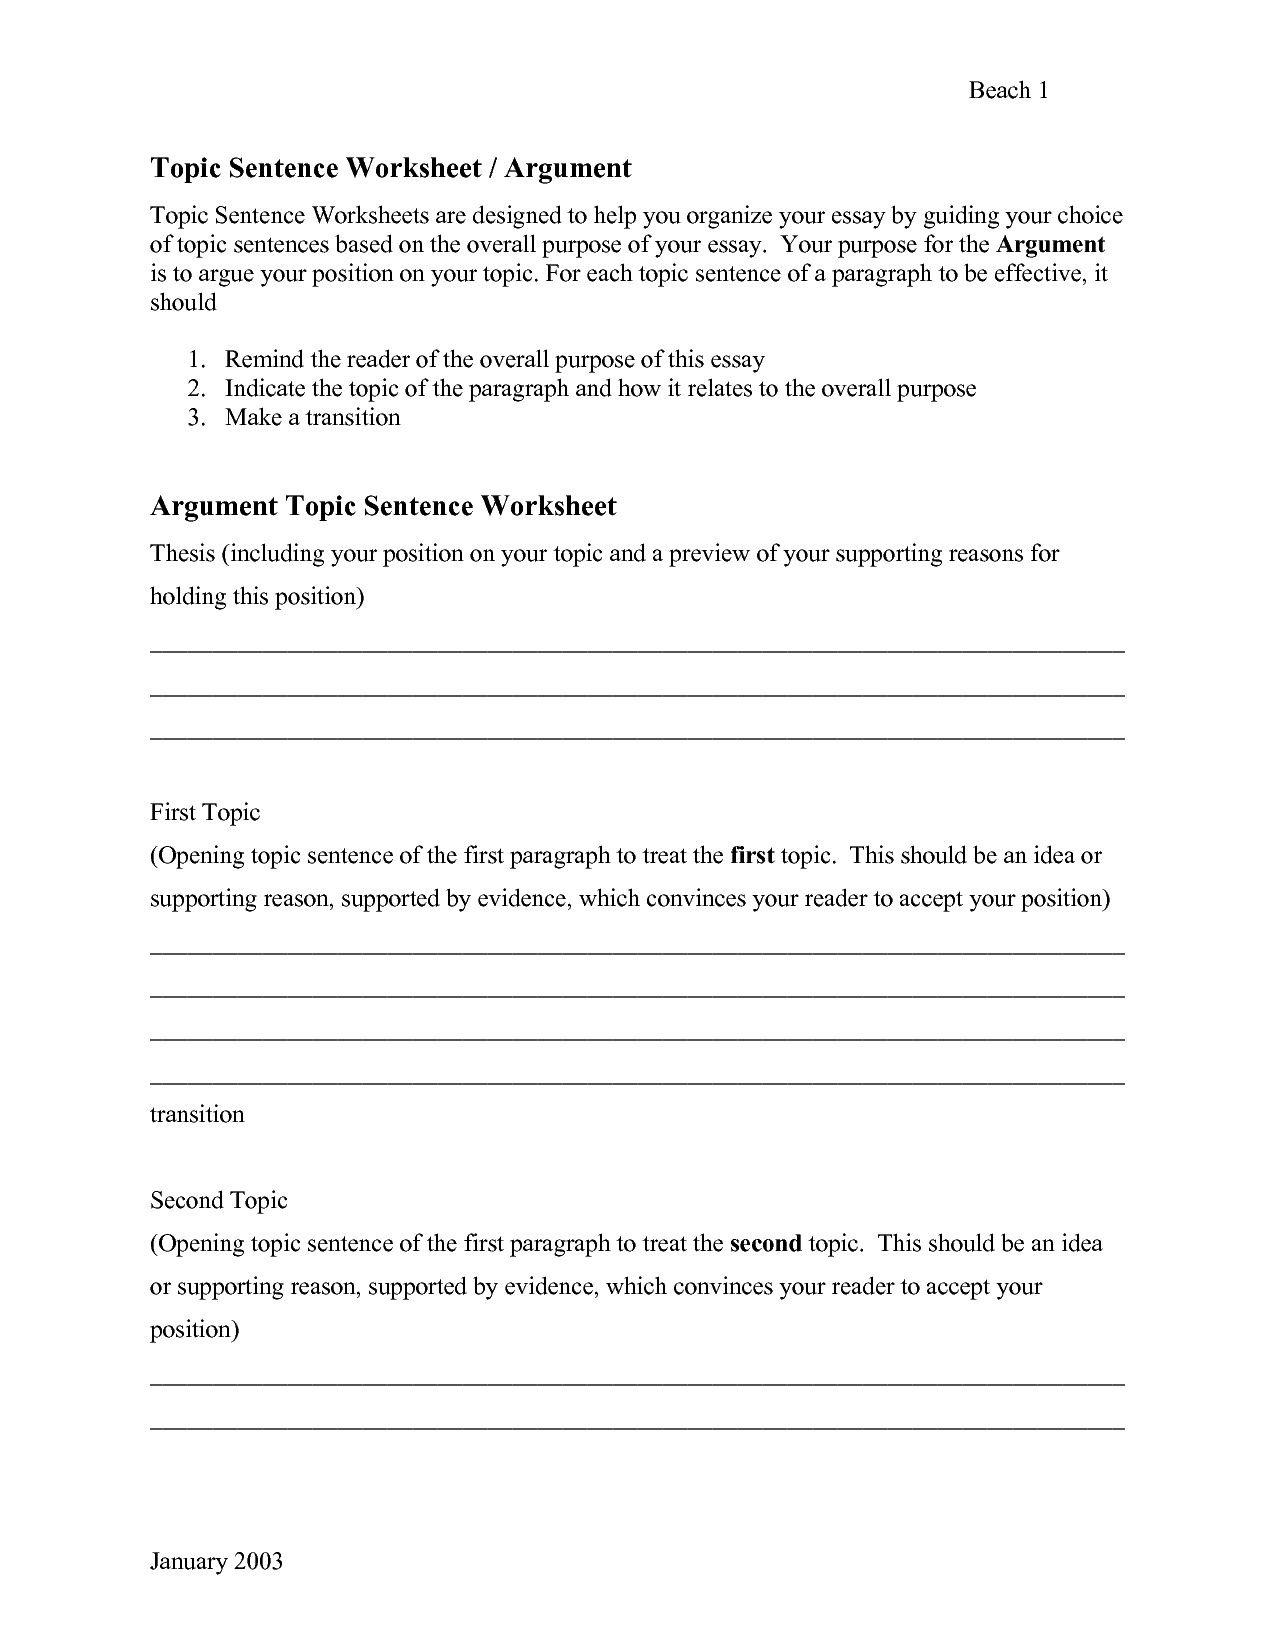 Topic Sentences Worksheets 3rd Grade In